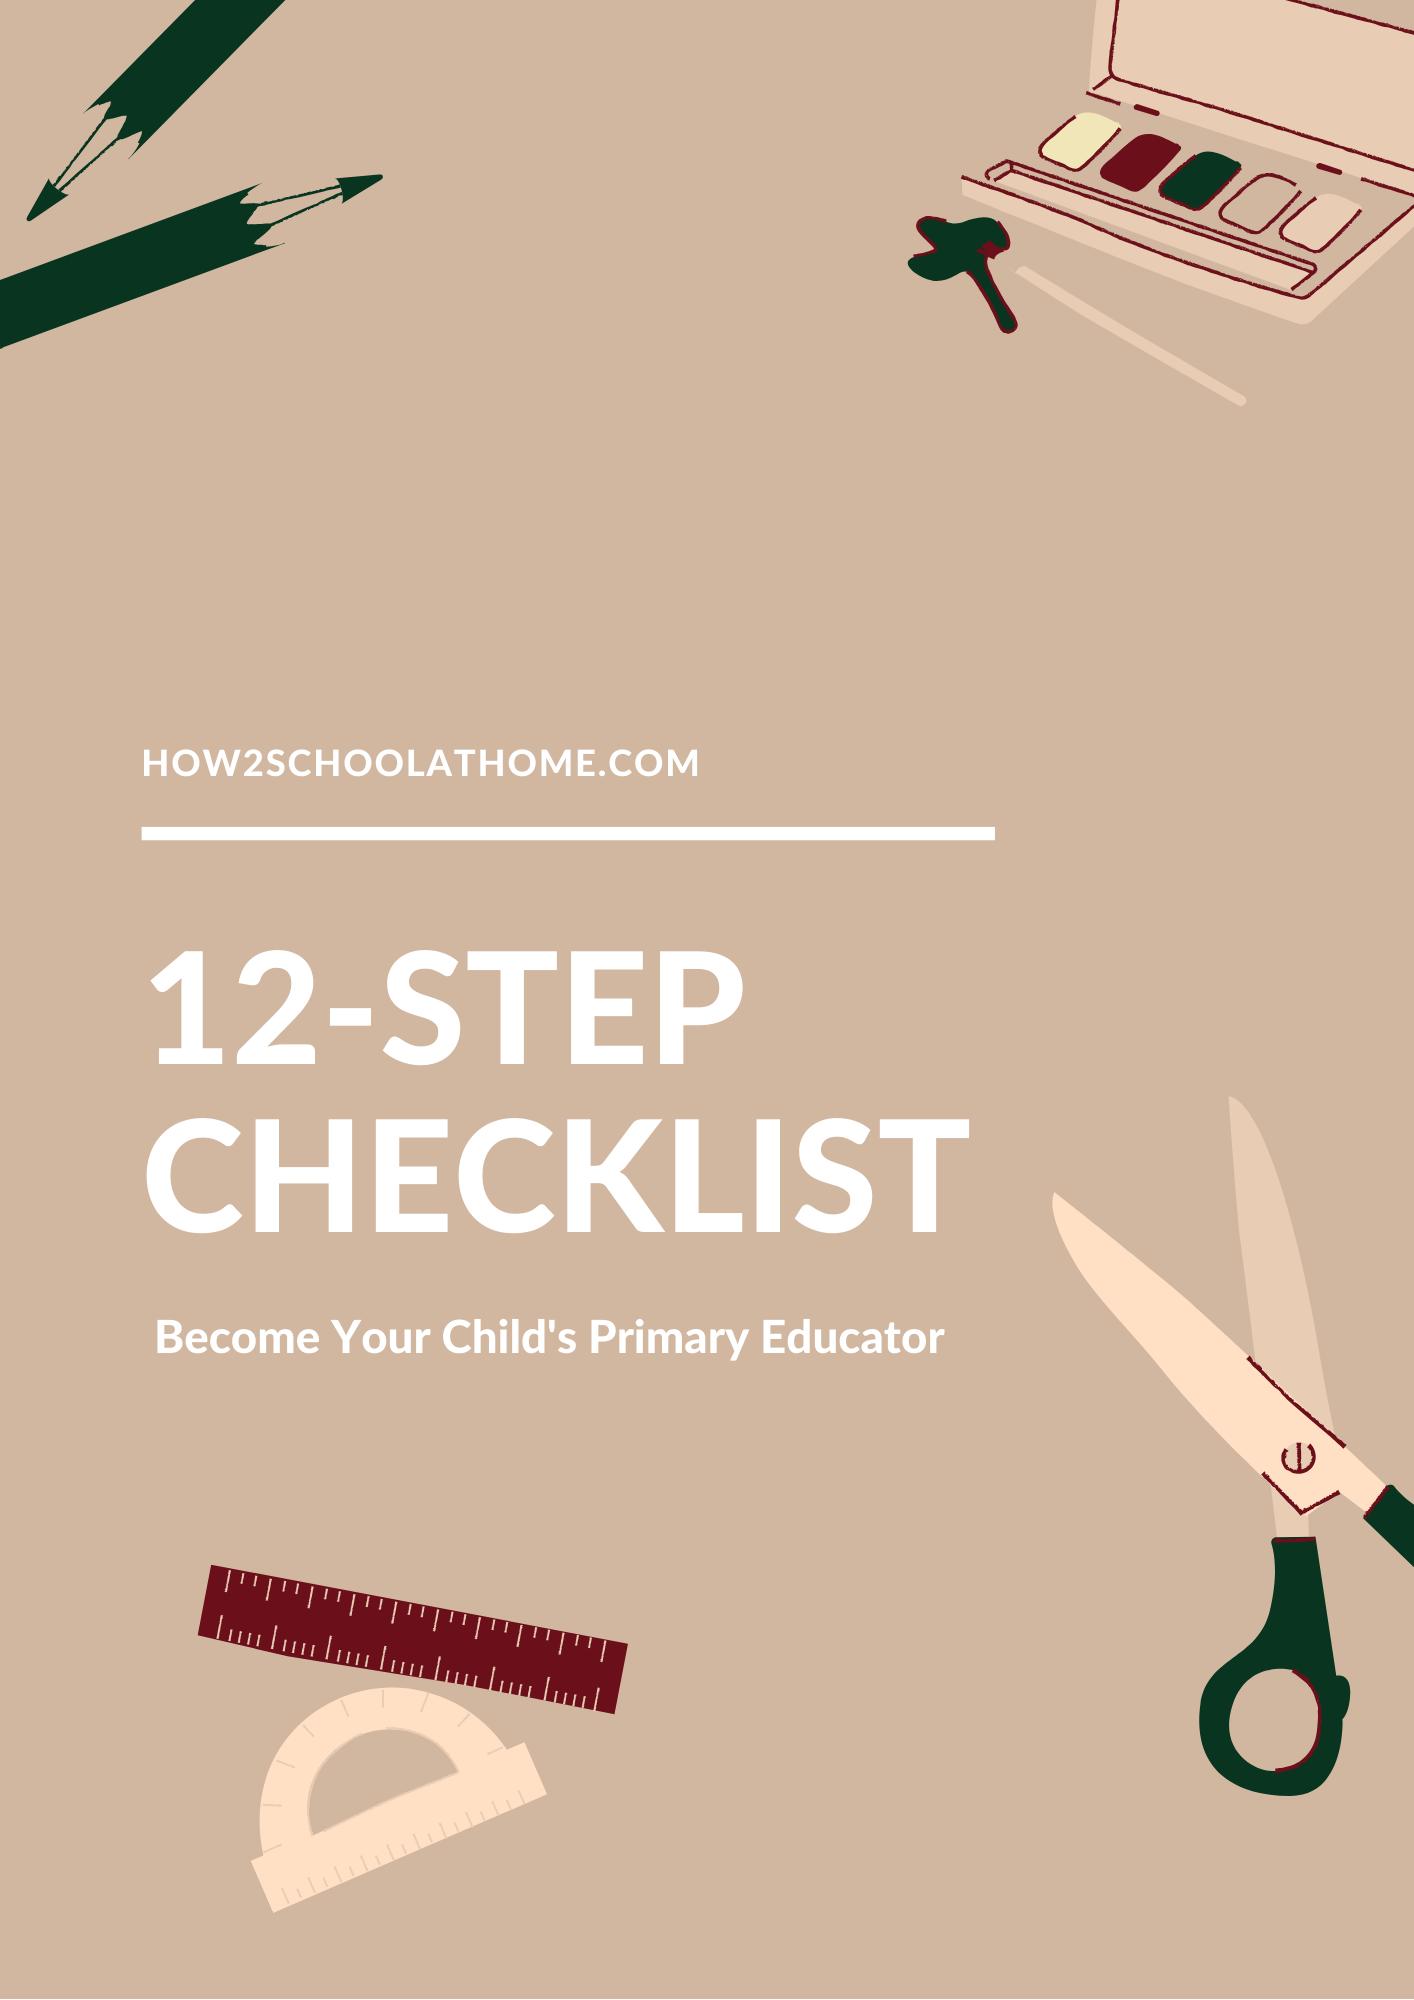 12 step checklist